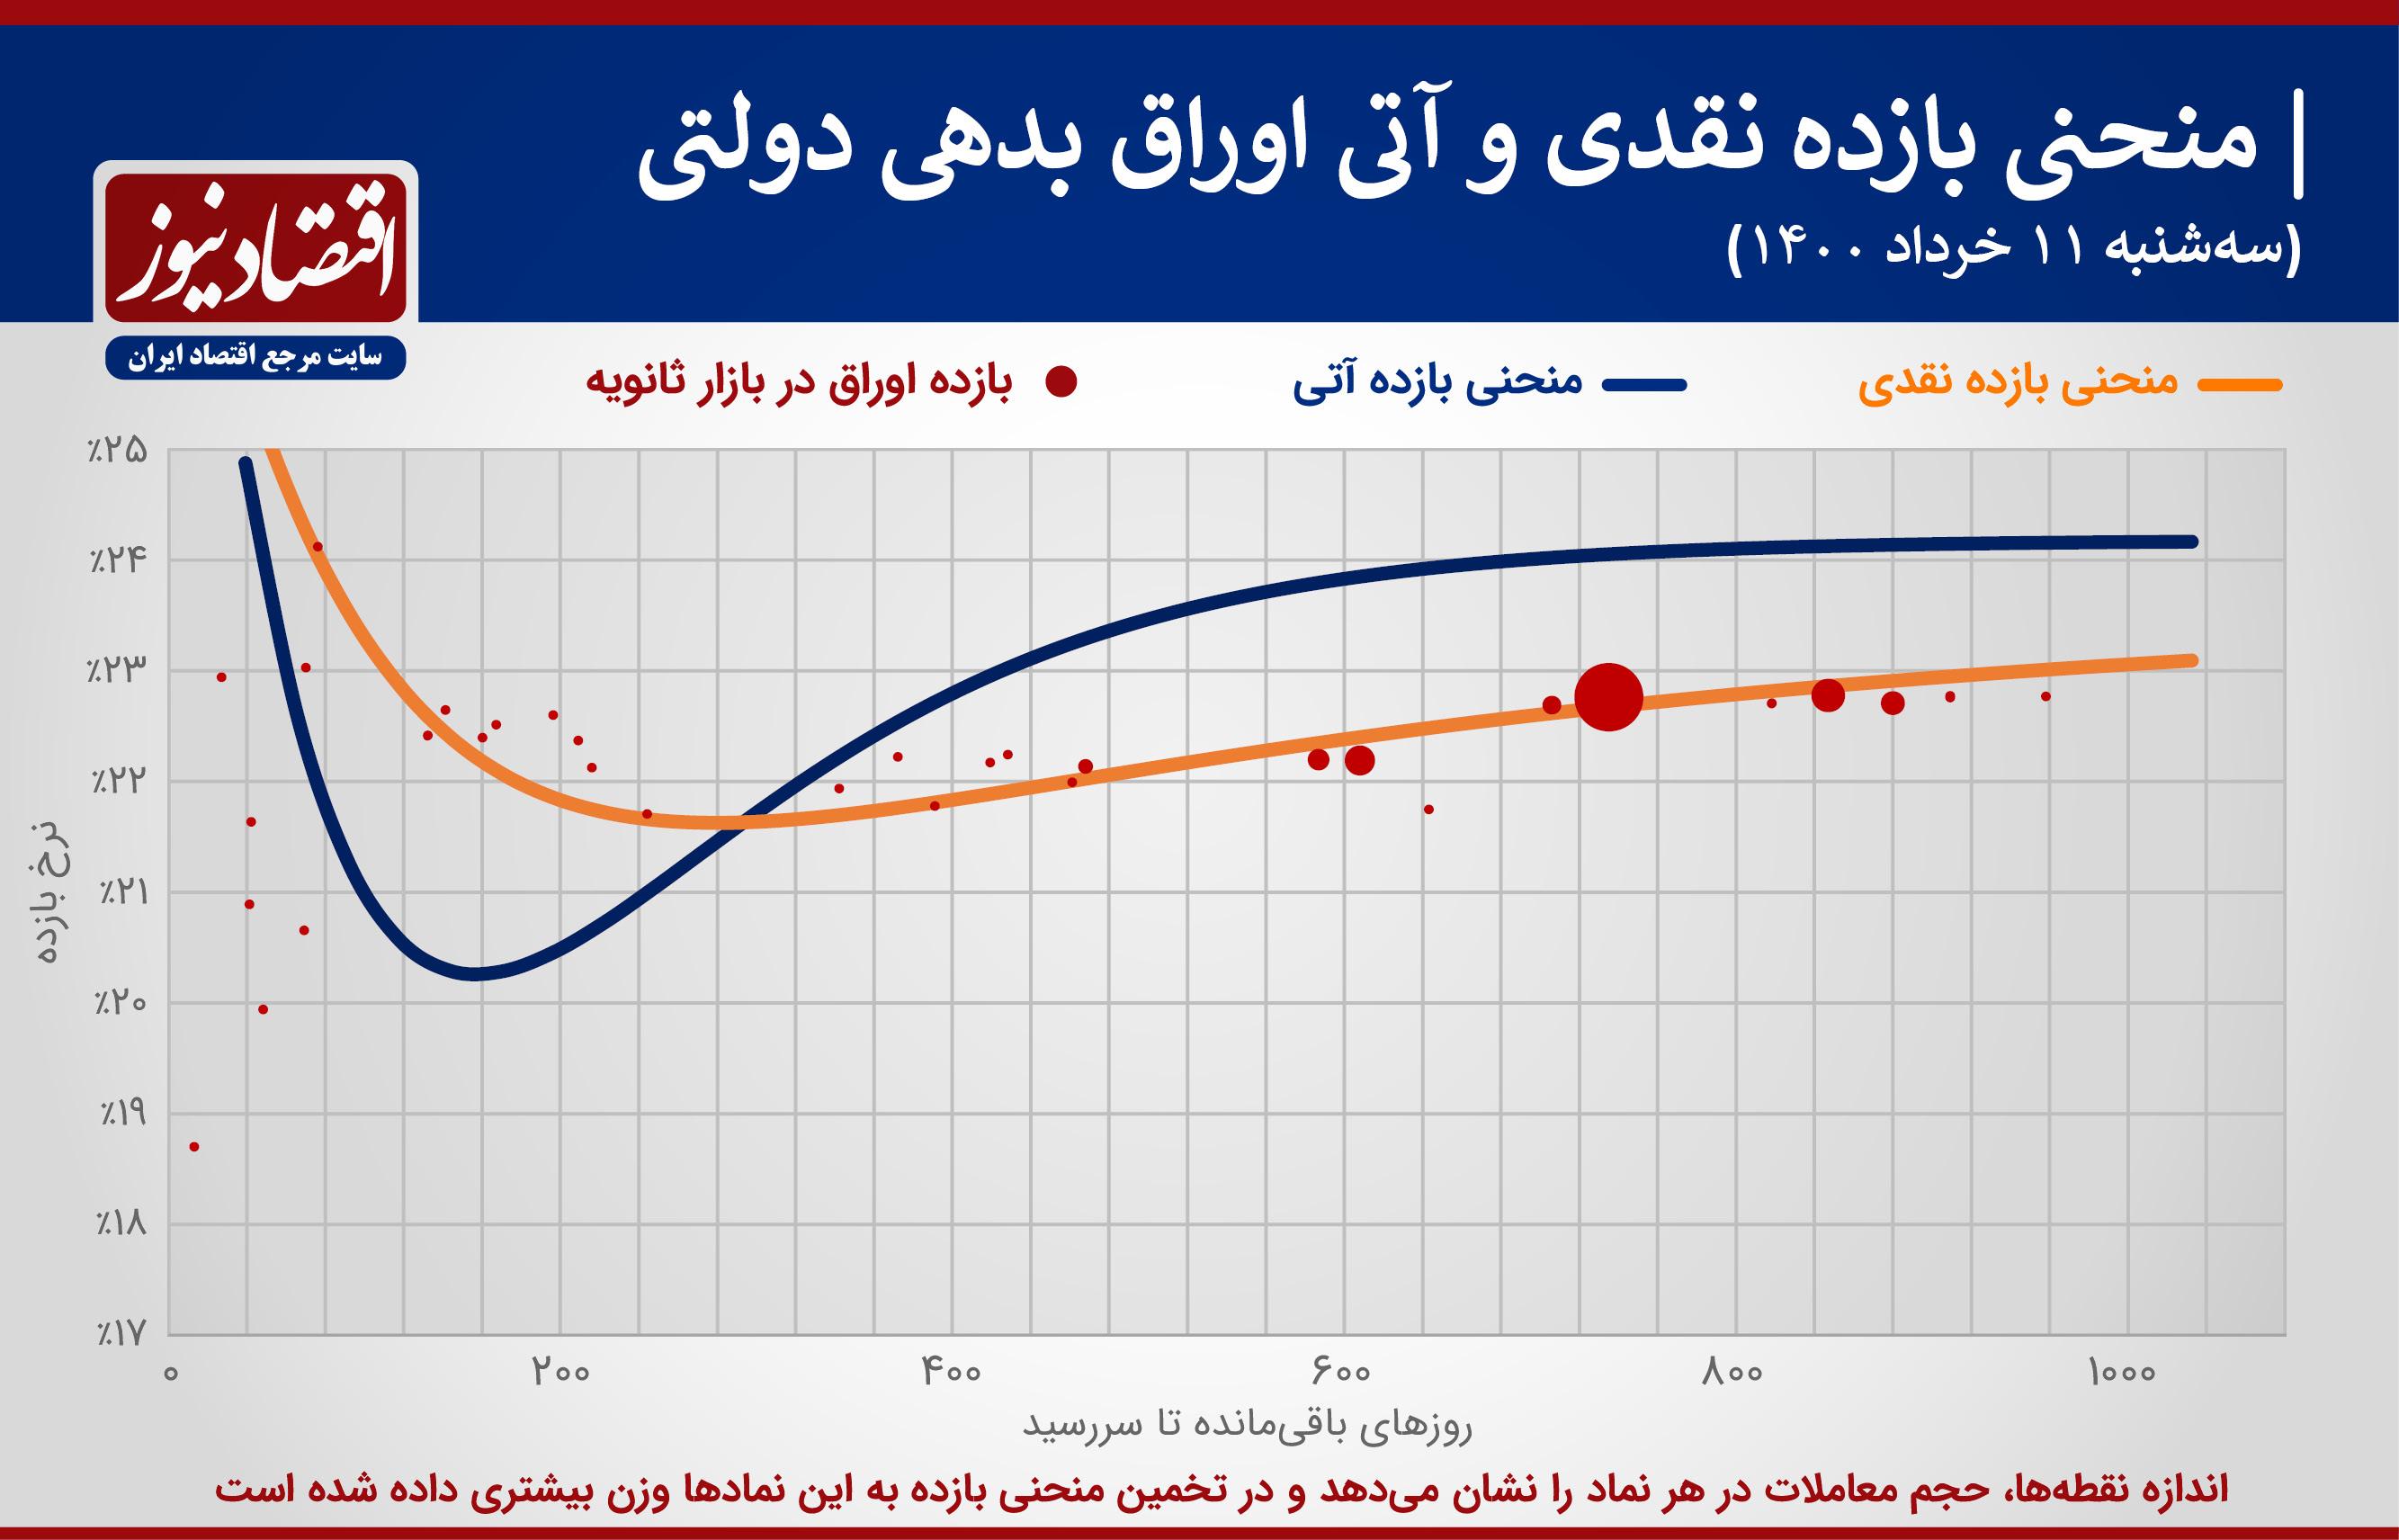 اوارق+نمودار